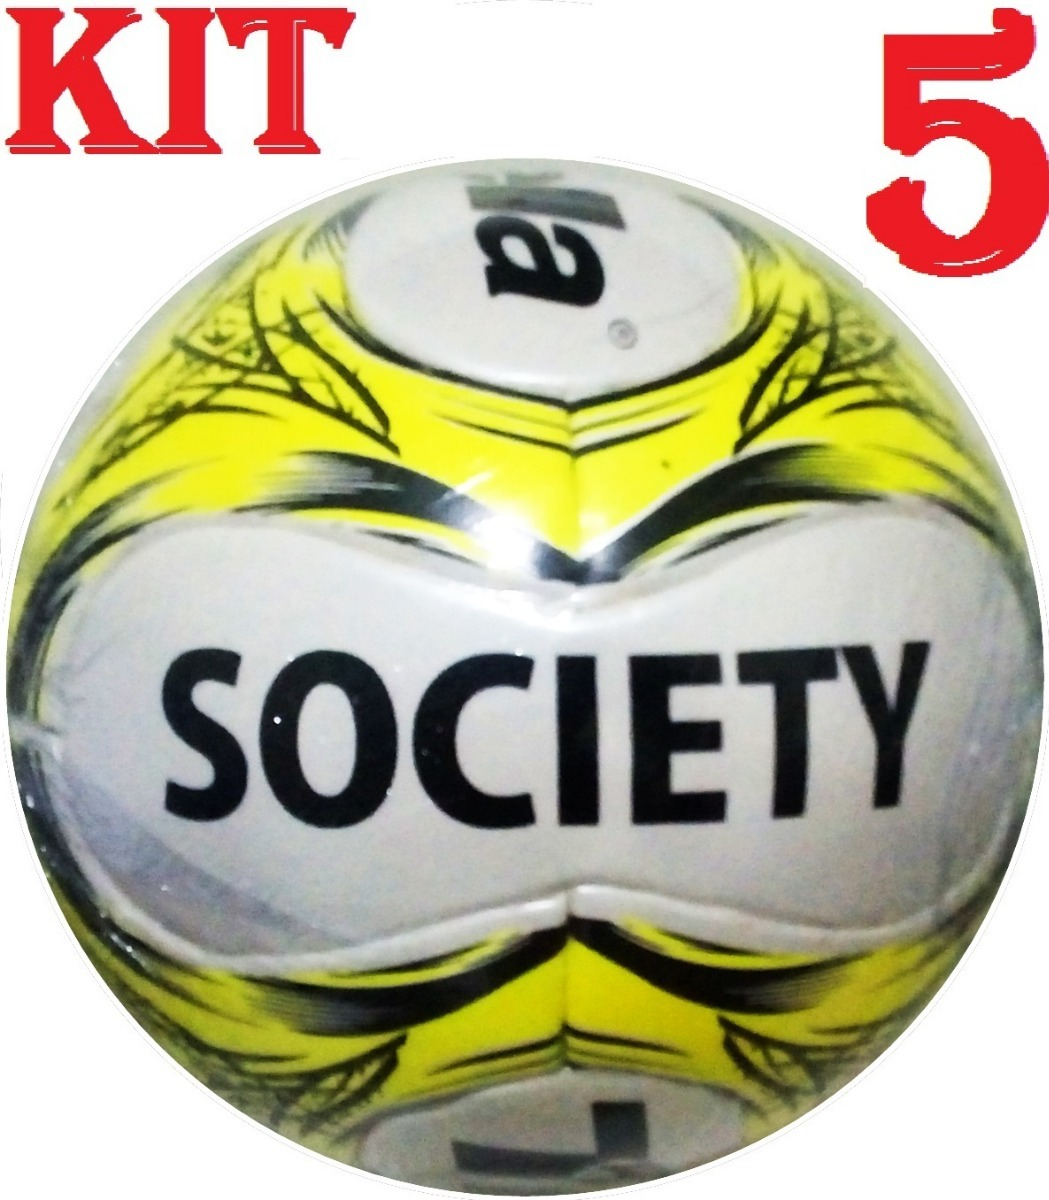 e639e9477d kit 5 bolas futebol society 100% pu trivella - brasil gold. Carregando zoom.